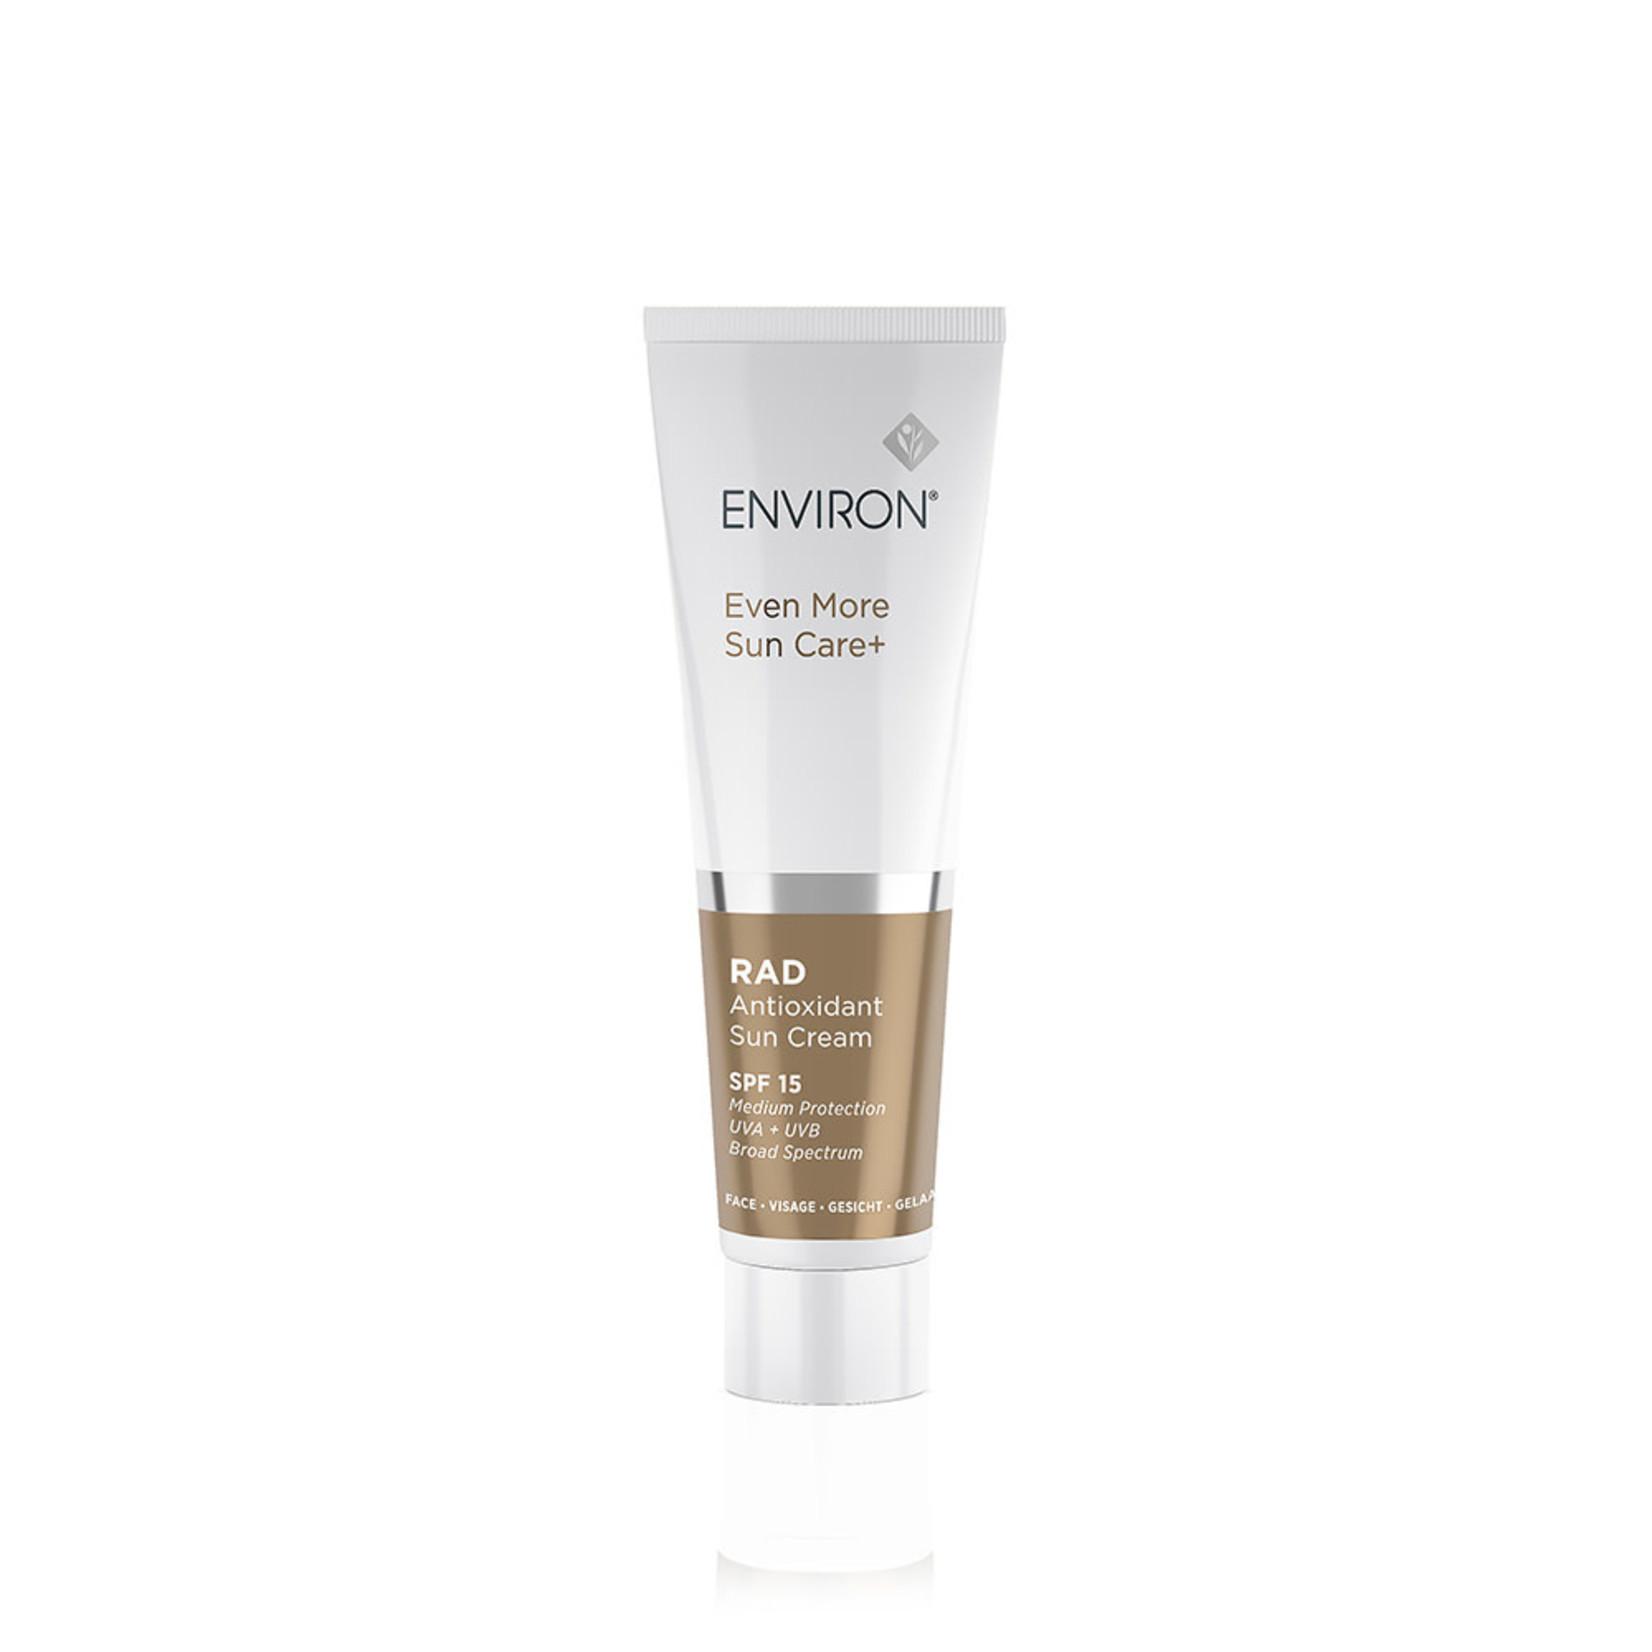 Environ RAD Antioxidant Sun cream SPF15 100ml